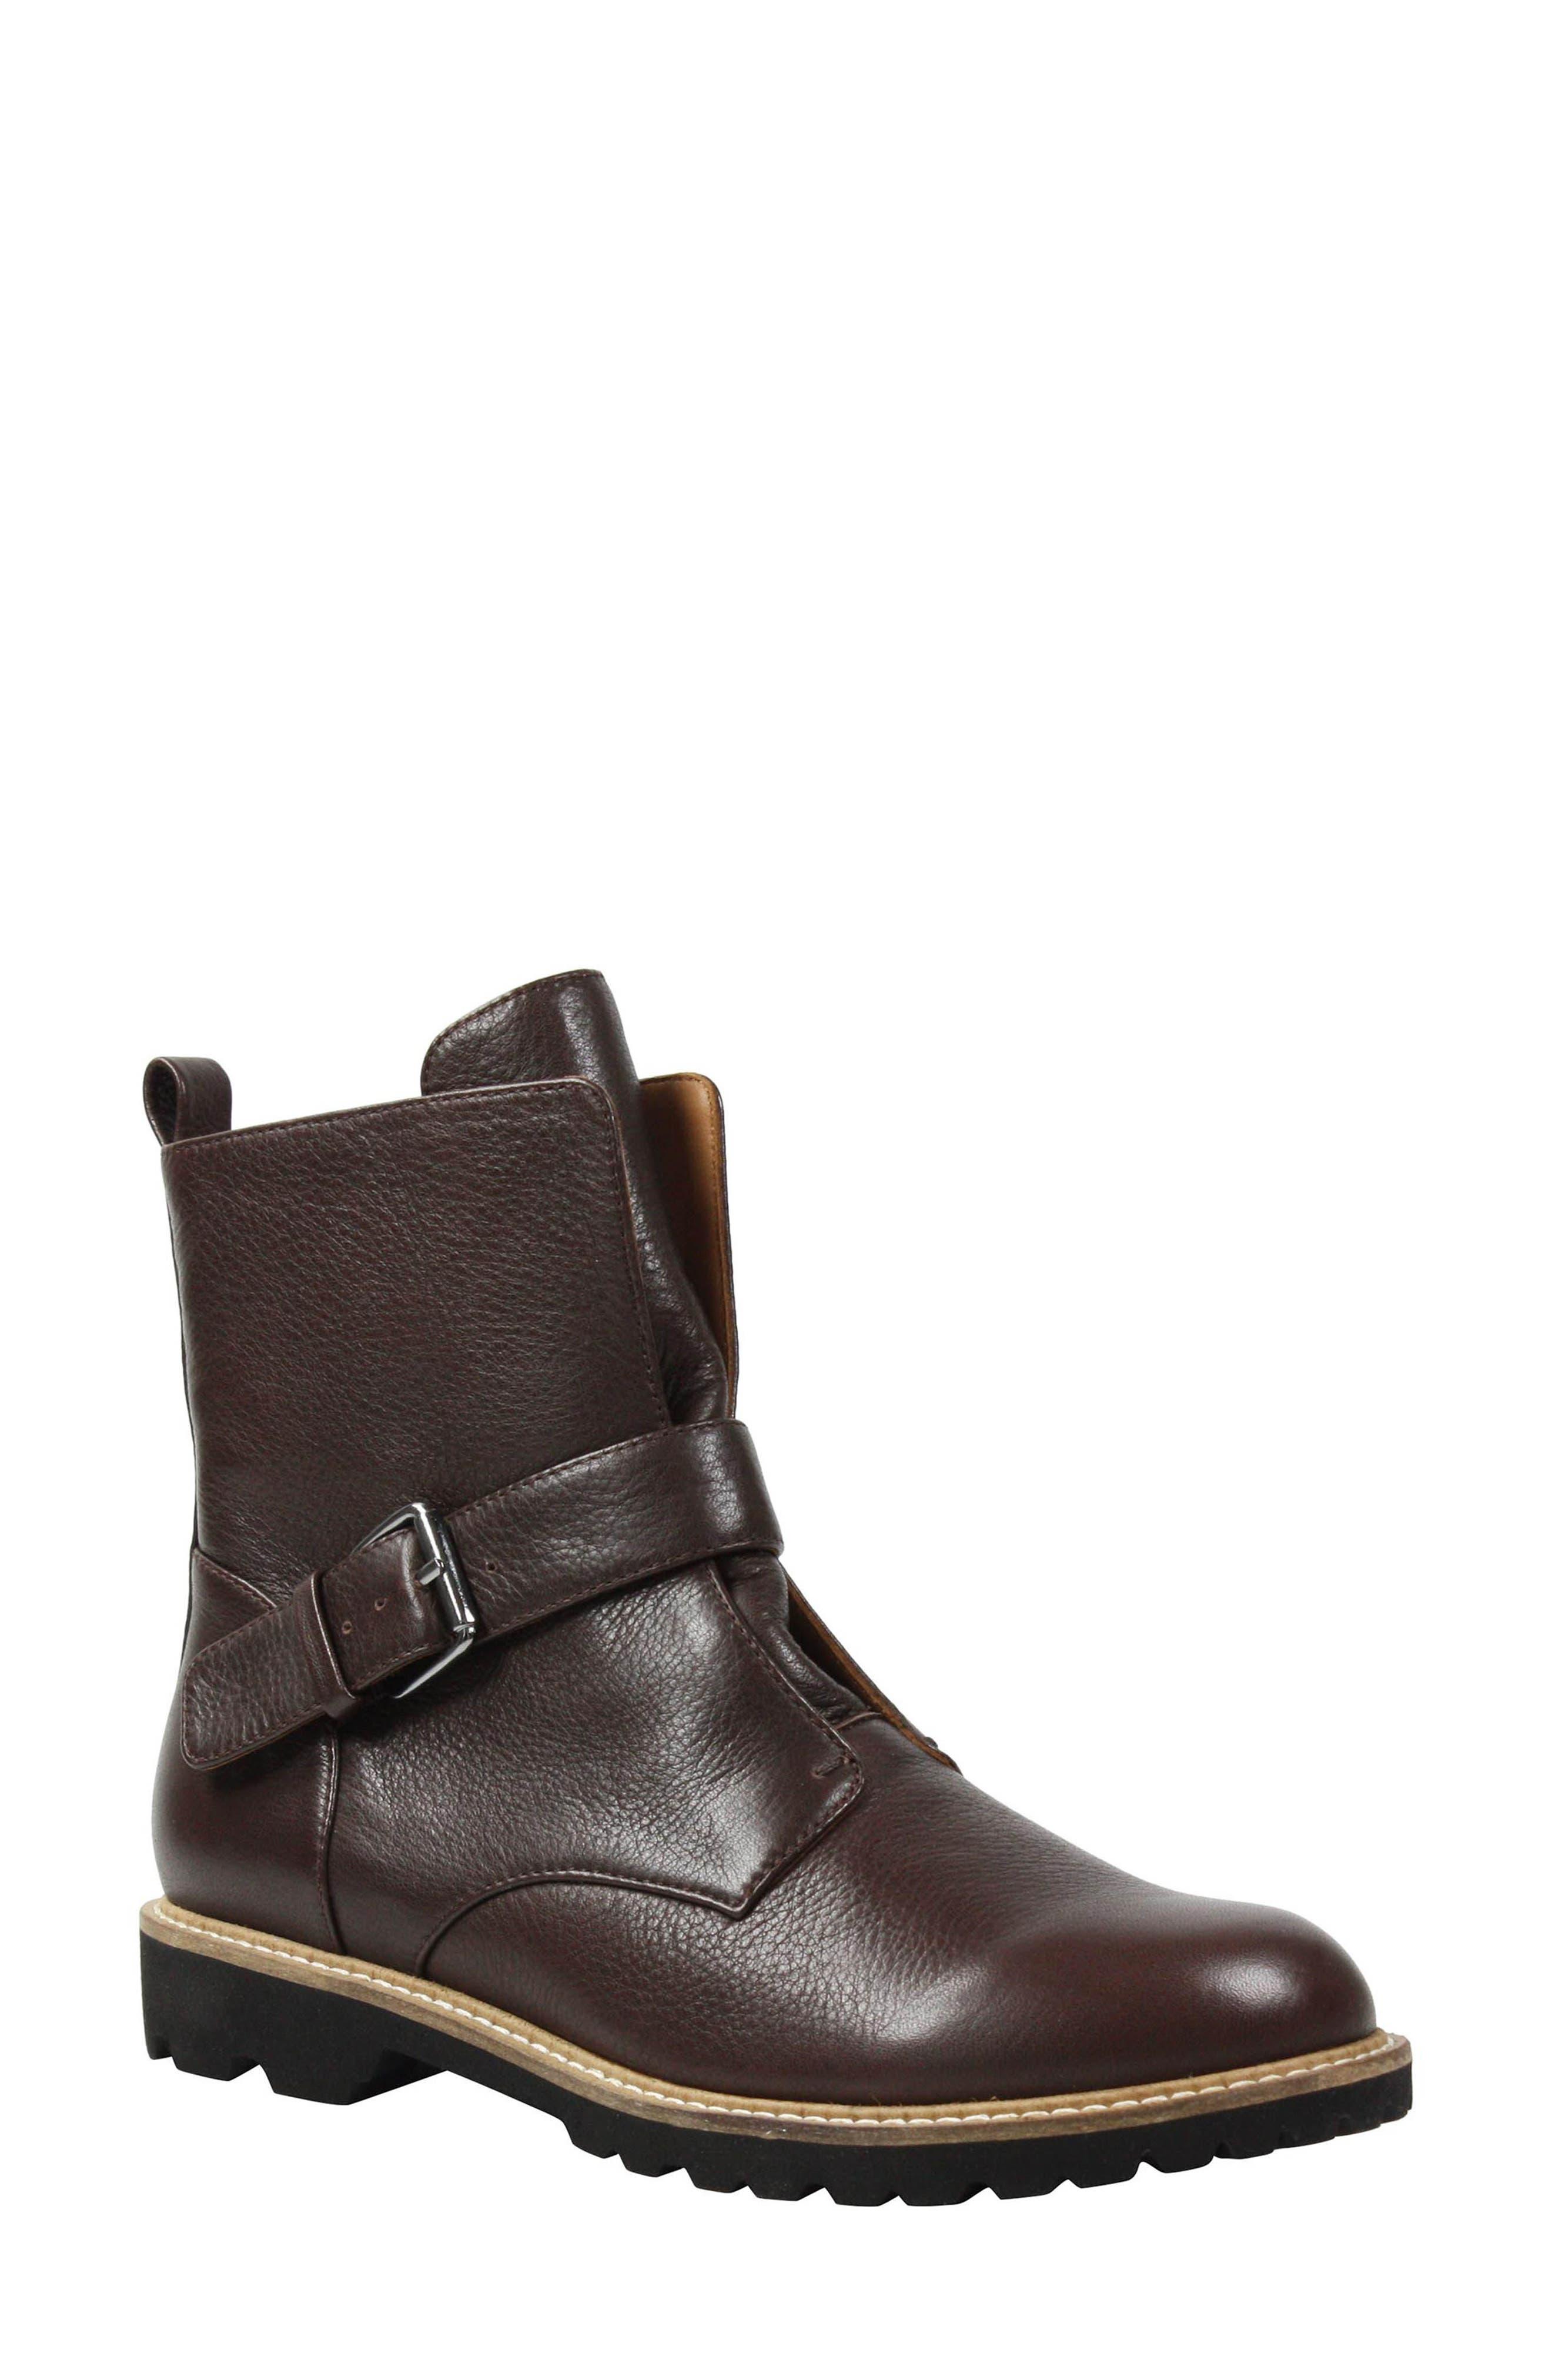 Rapolano Boot,                             Main thumbnail 1, color,                             Moro Leather